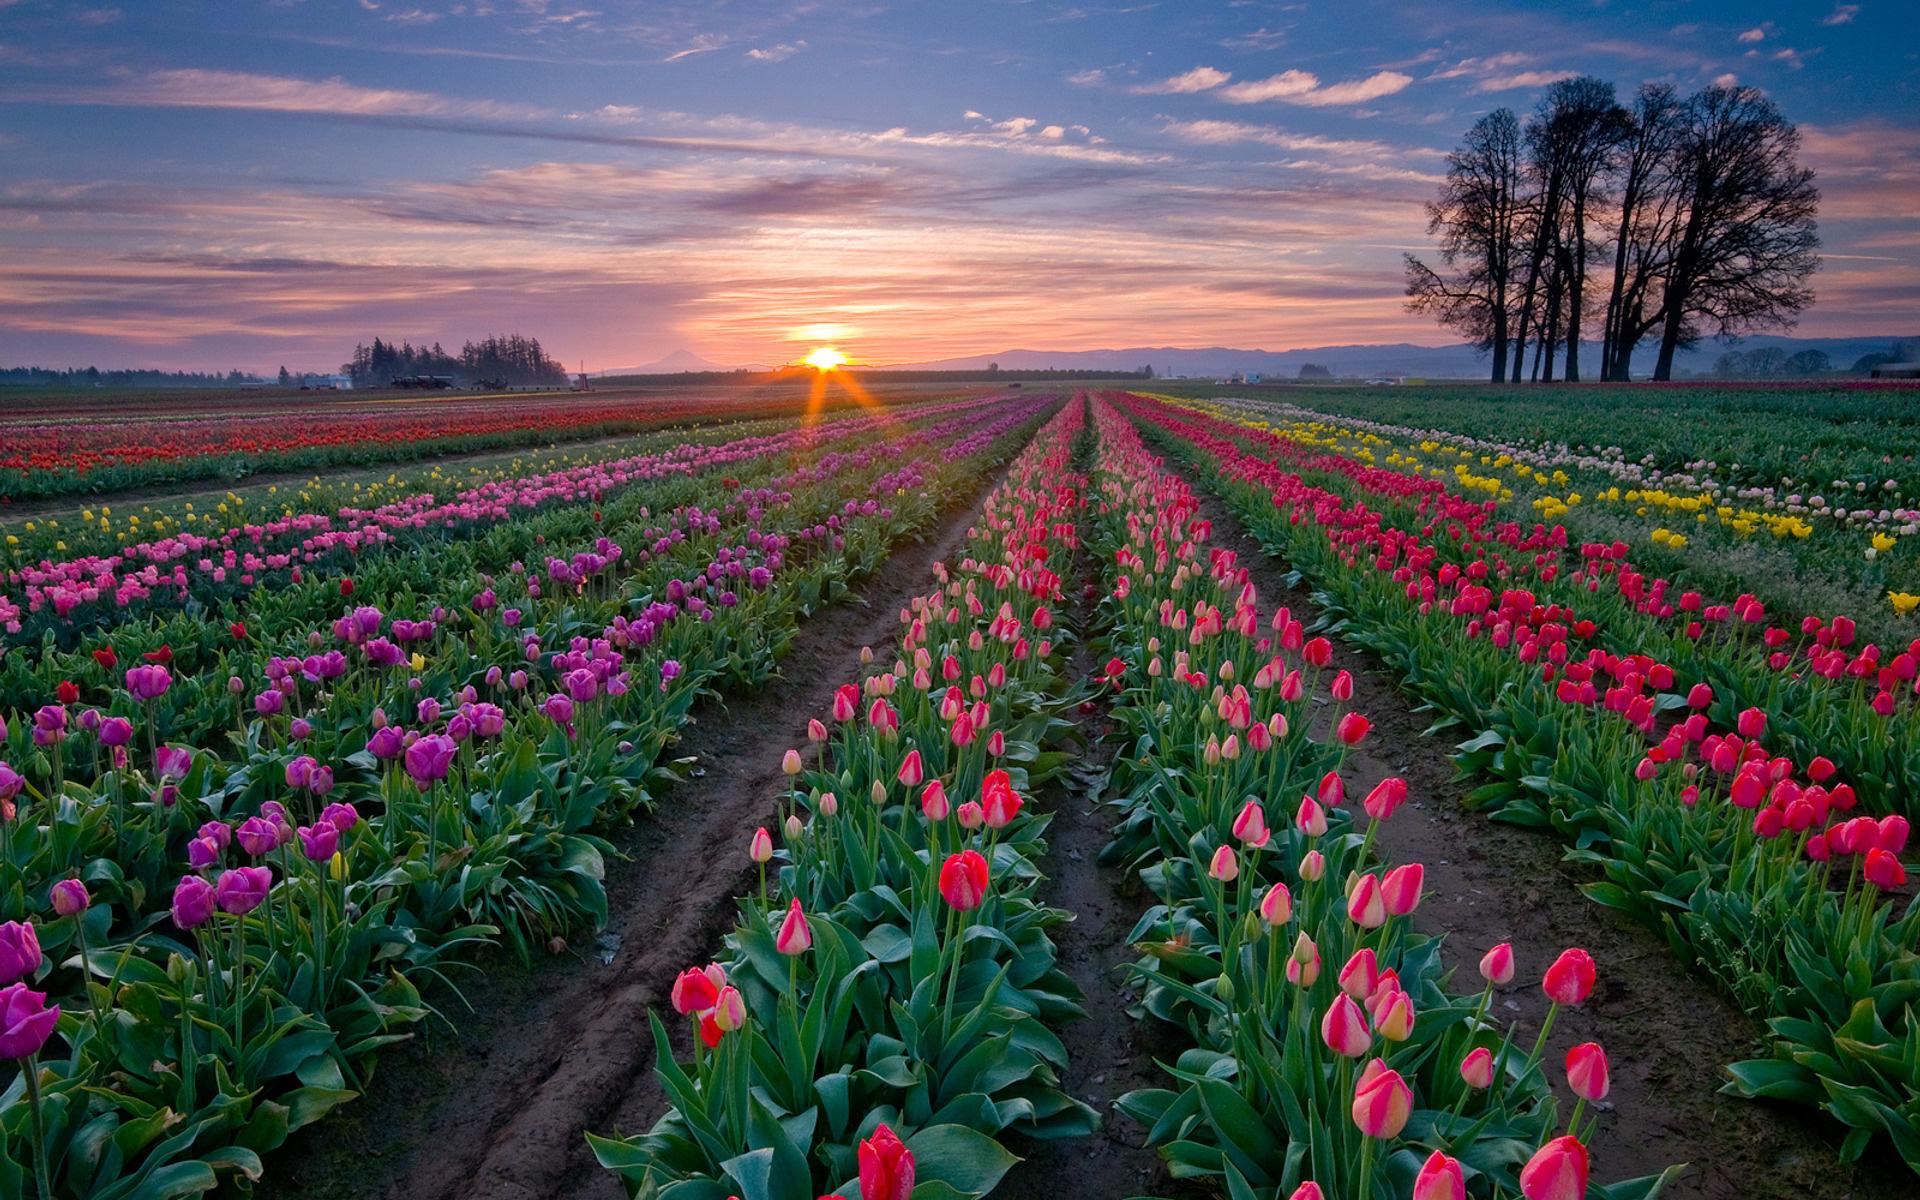 Amazing Tulip Field Wallpaper